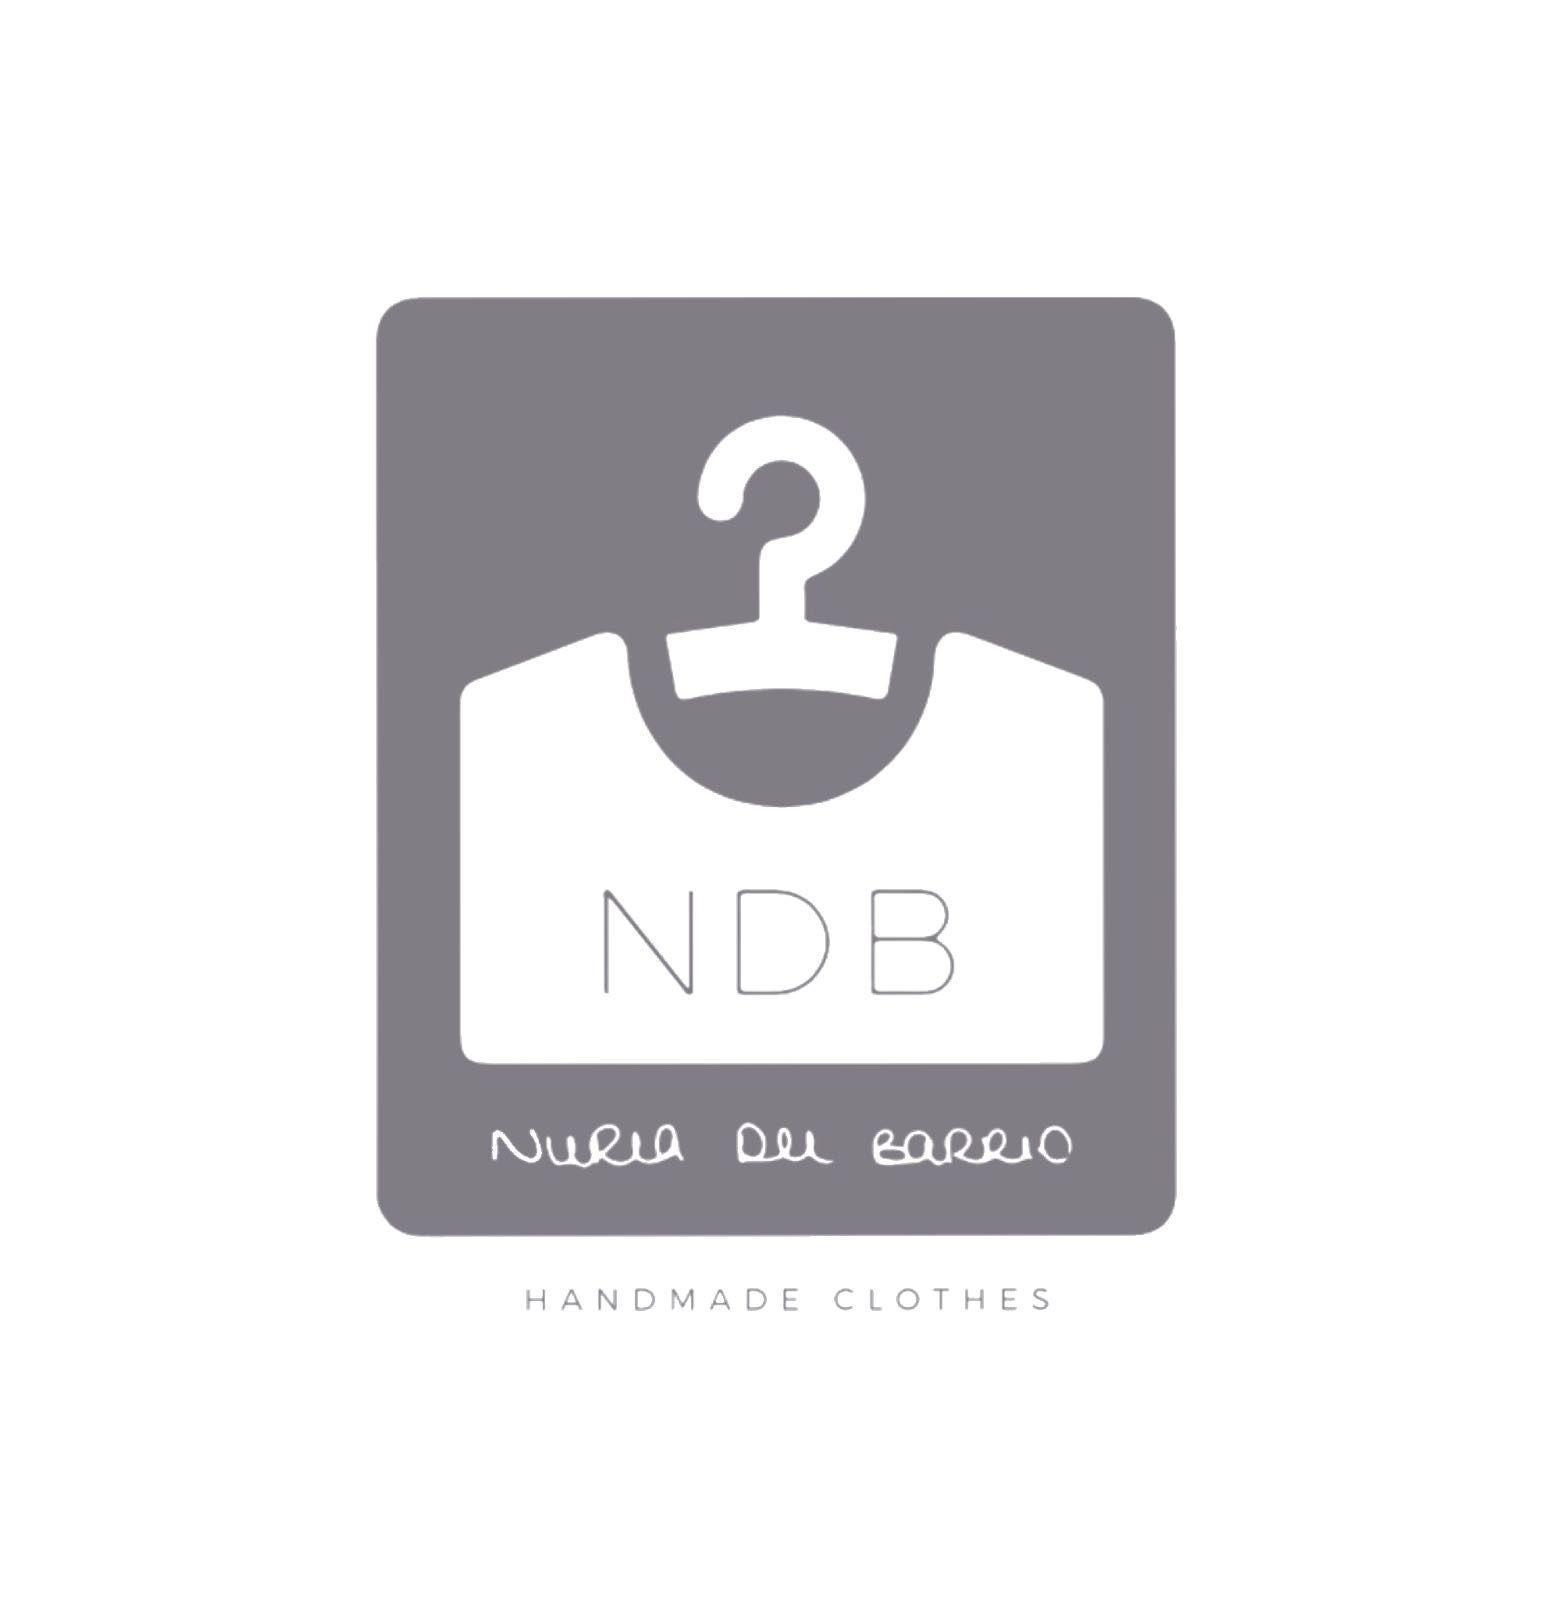 NDBclothes